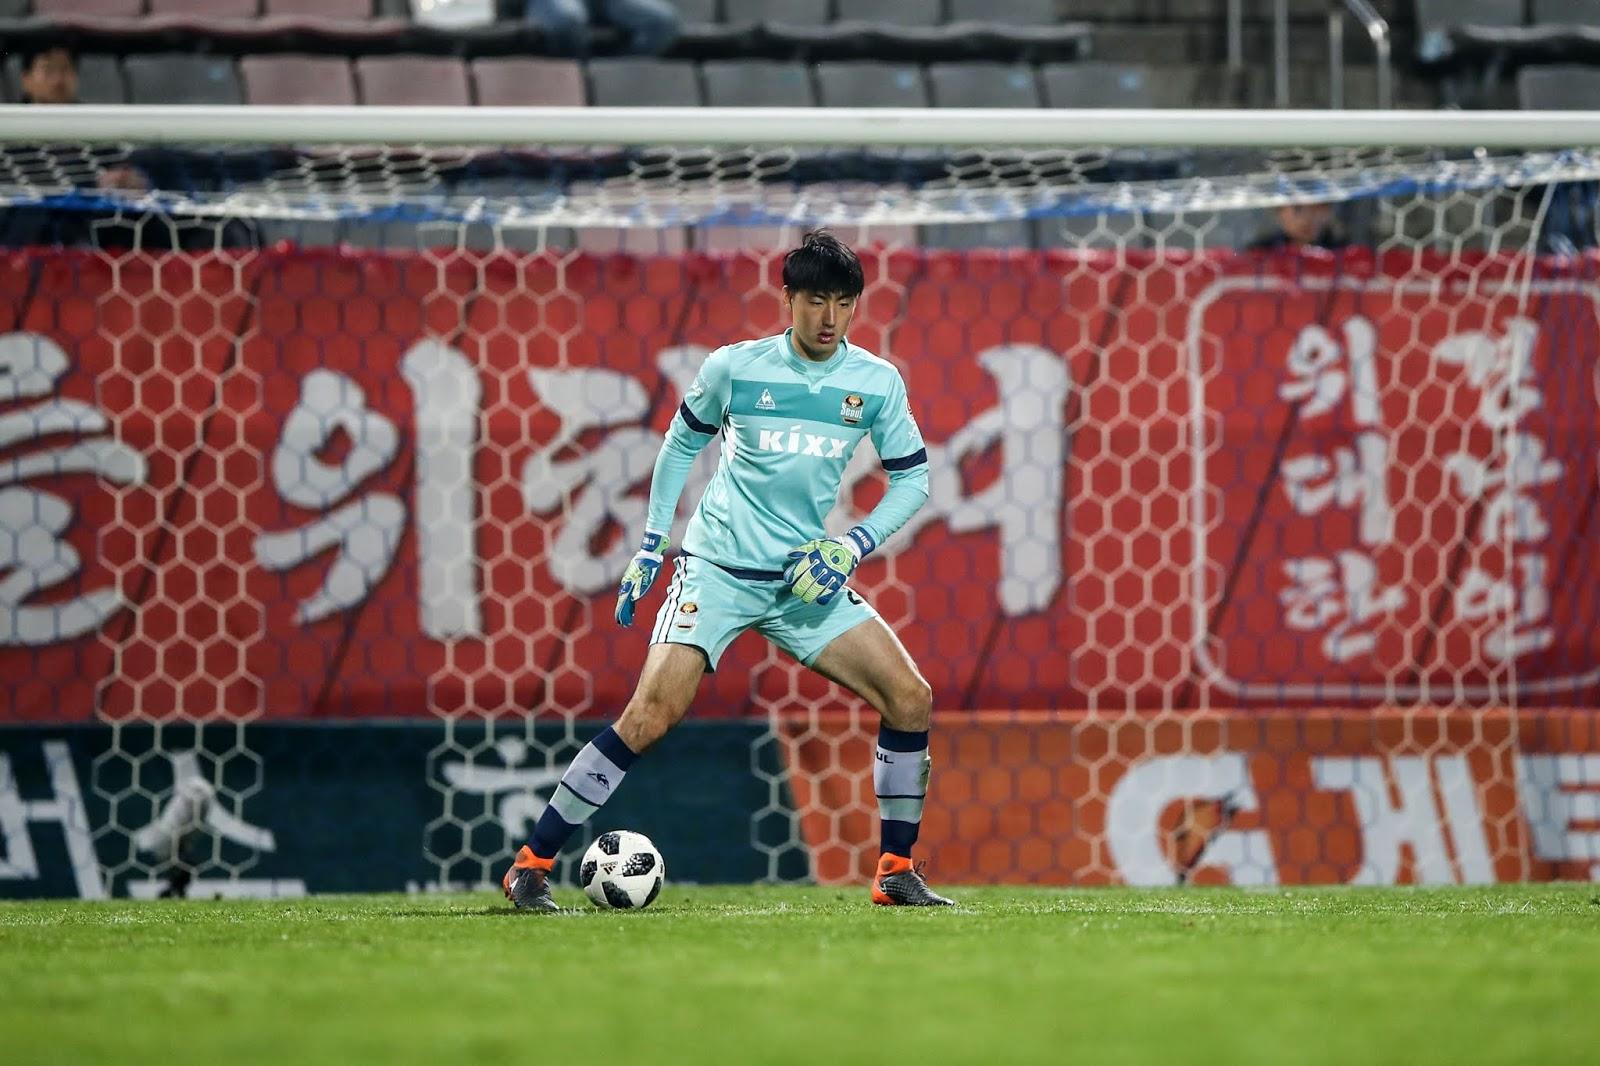 Preview: FC Seoul Vs Gyeongnam FC